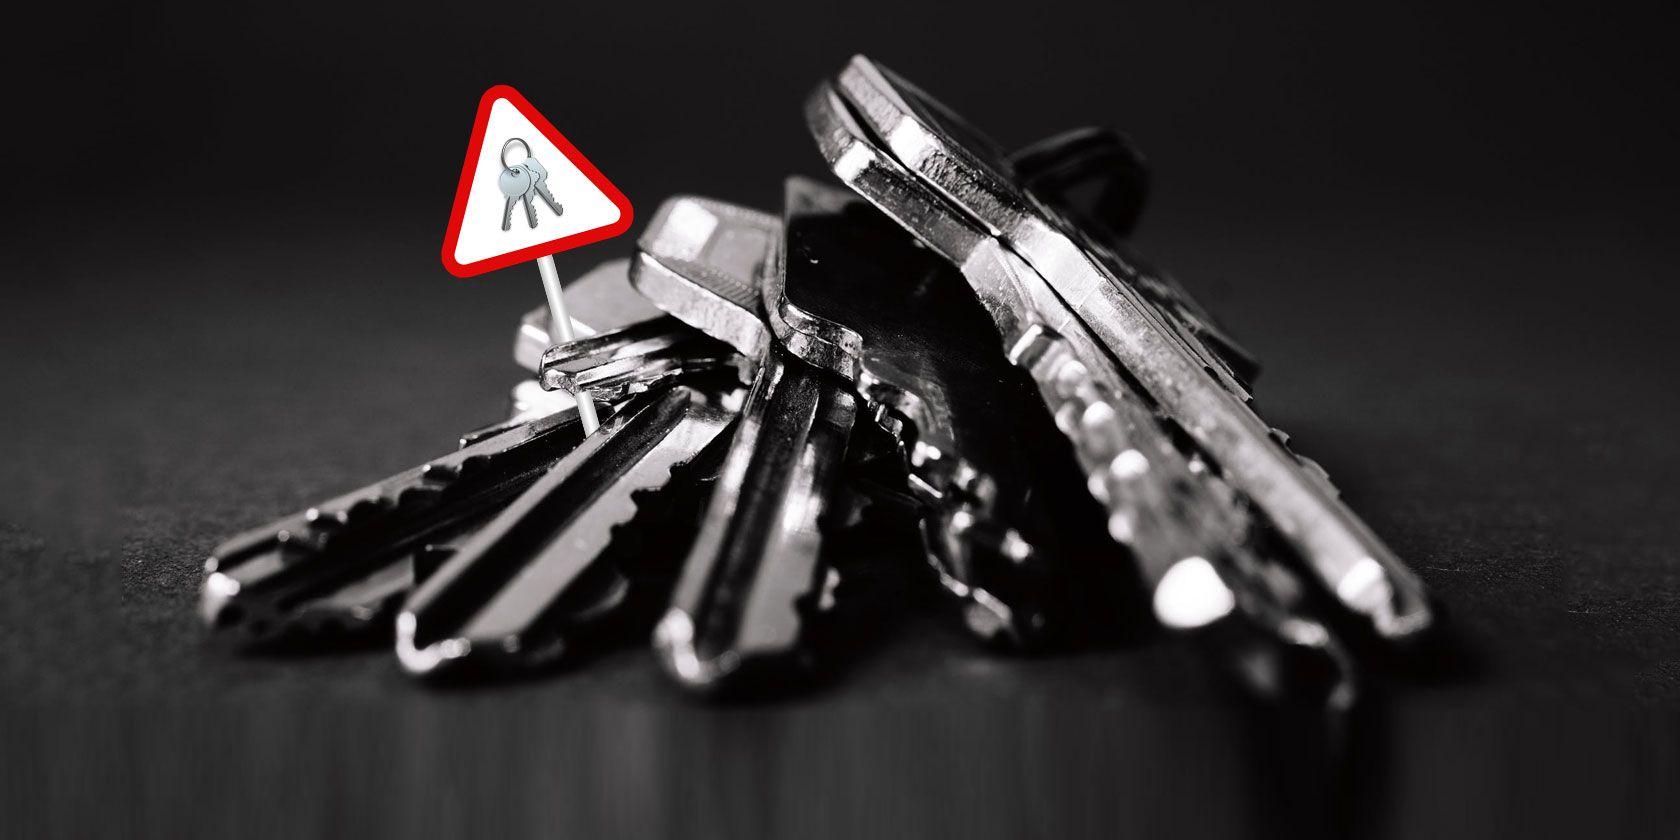 mac-keychain-issues